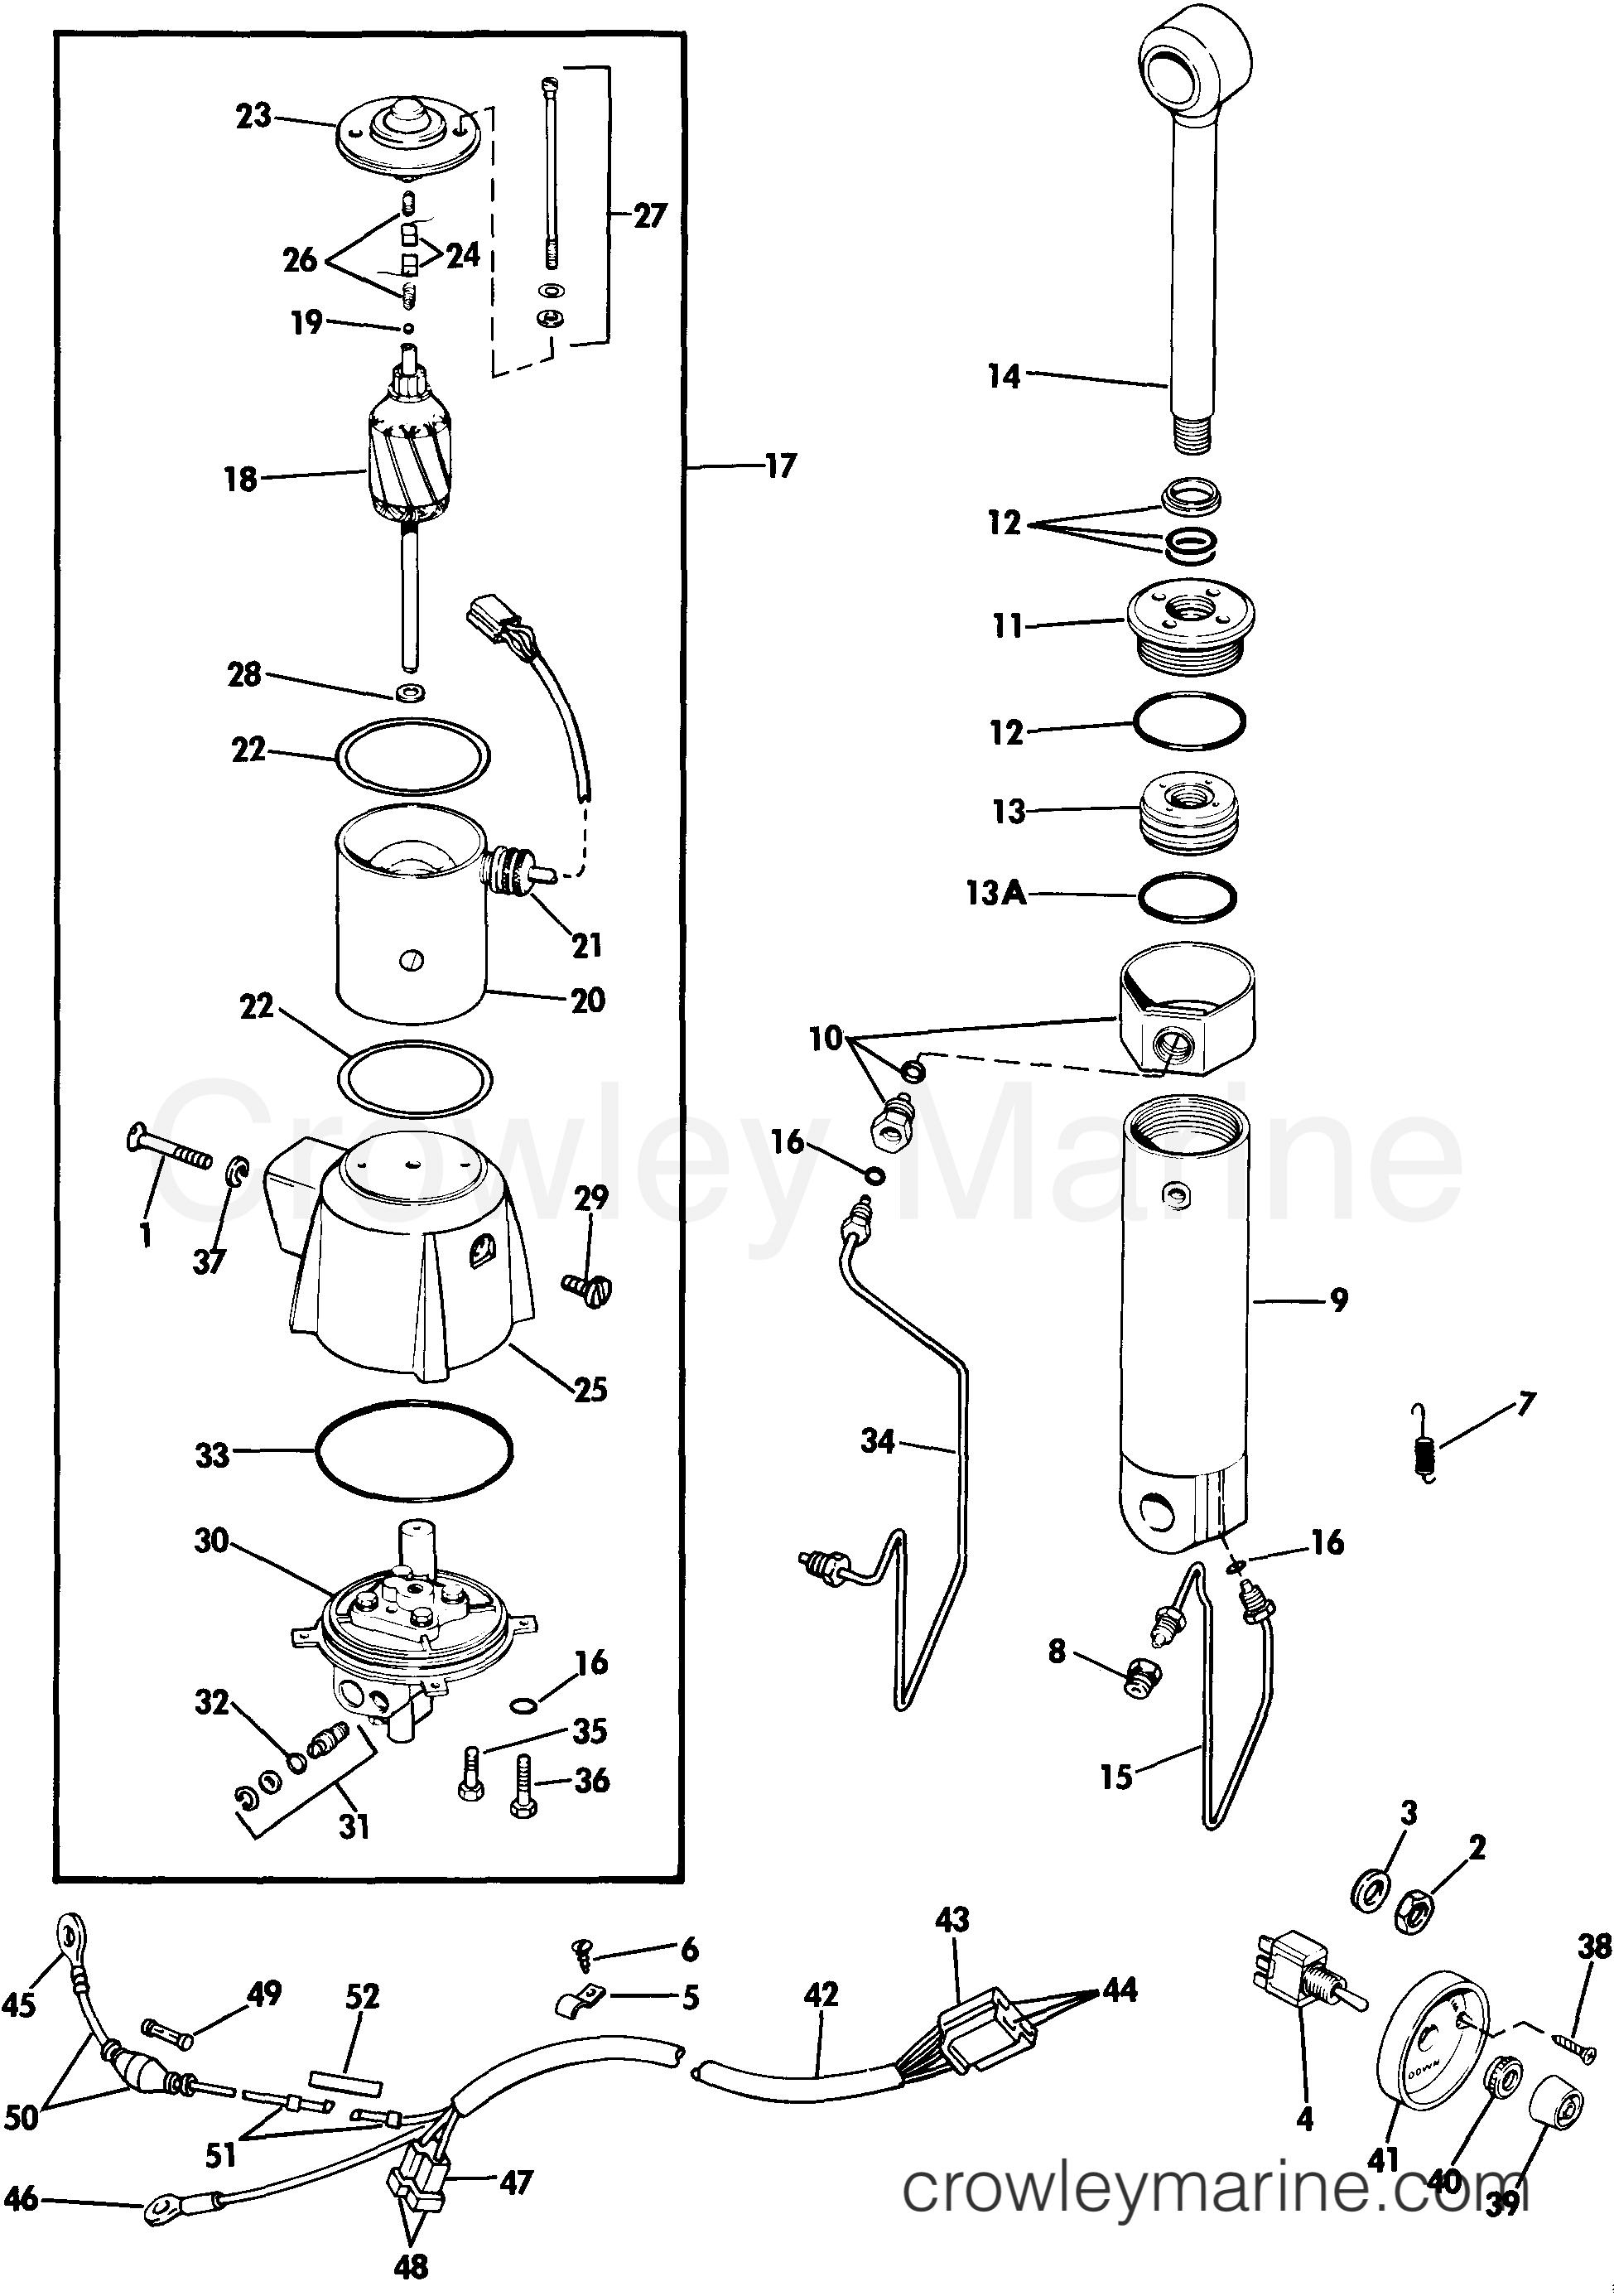 1985 Rigging Parts Accessories - Power Trim & Tilt - POWER TILT KIT ASSEMBLY 65 THRU 115